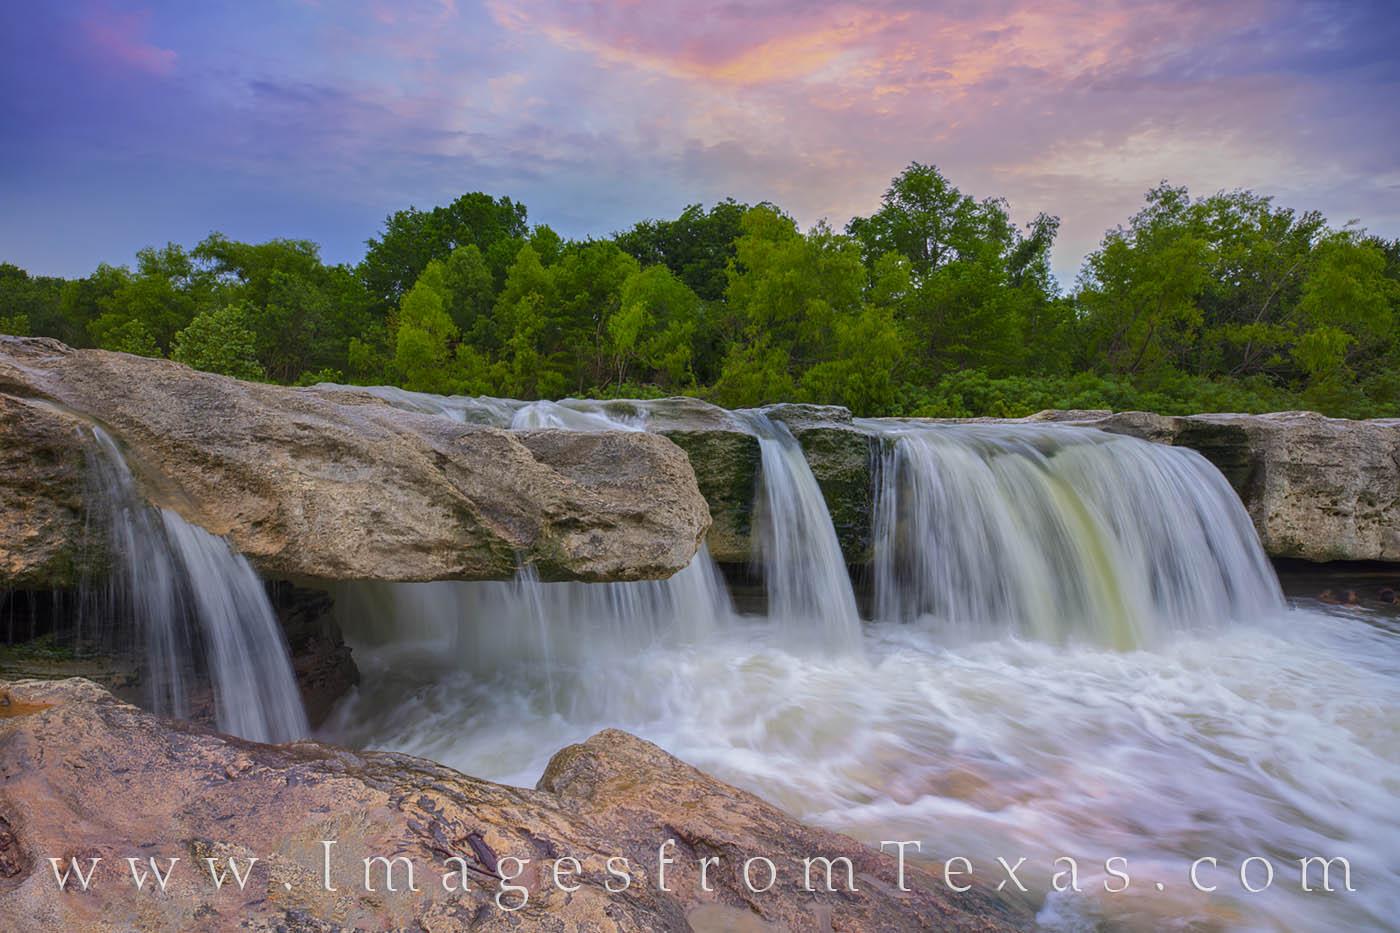 mckinney falls, lower falls, texas state parks, austin, waterfall, sunset, photo